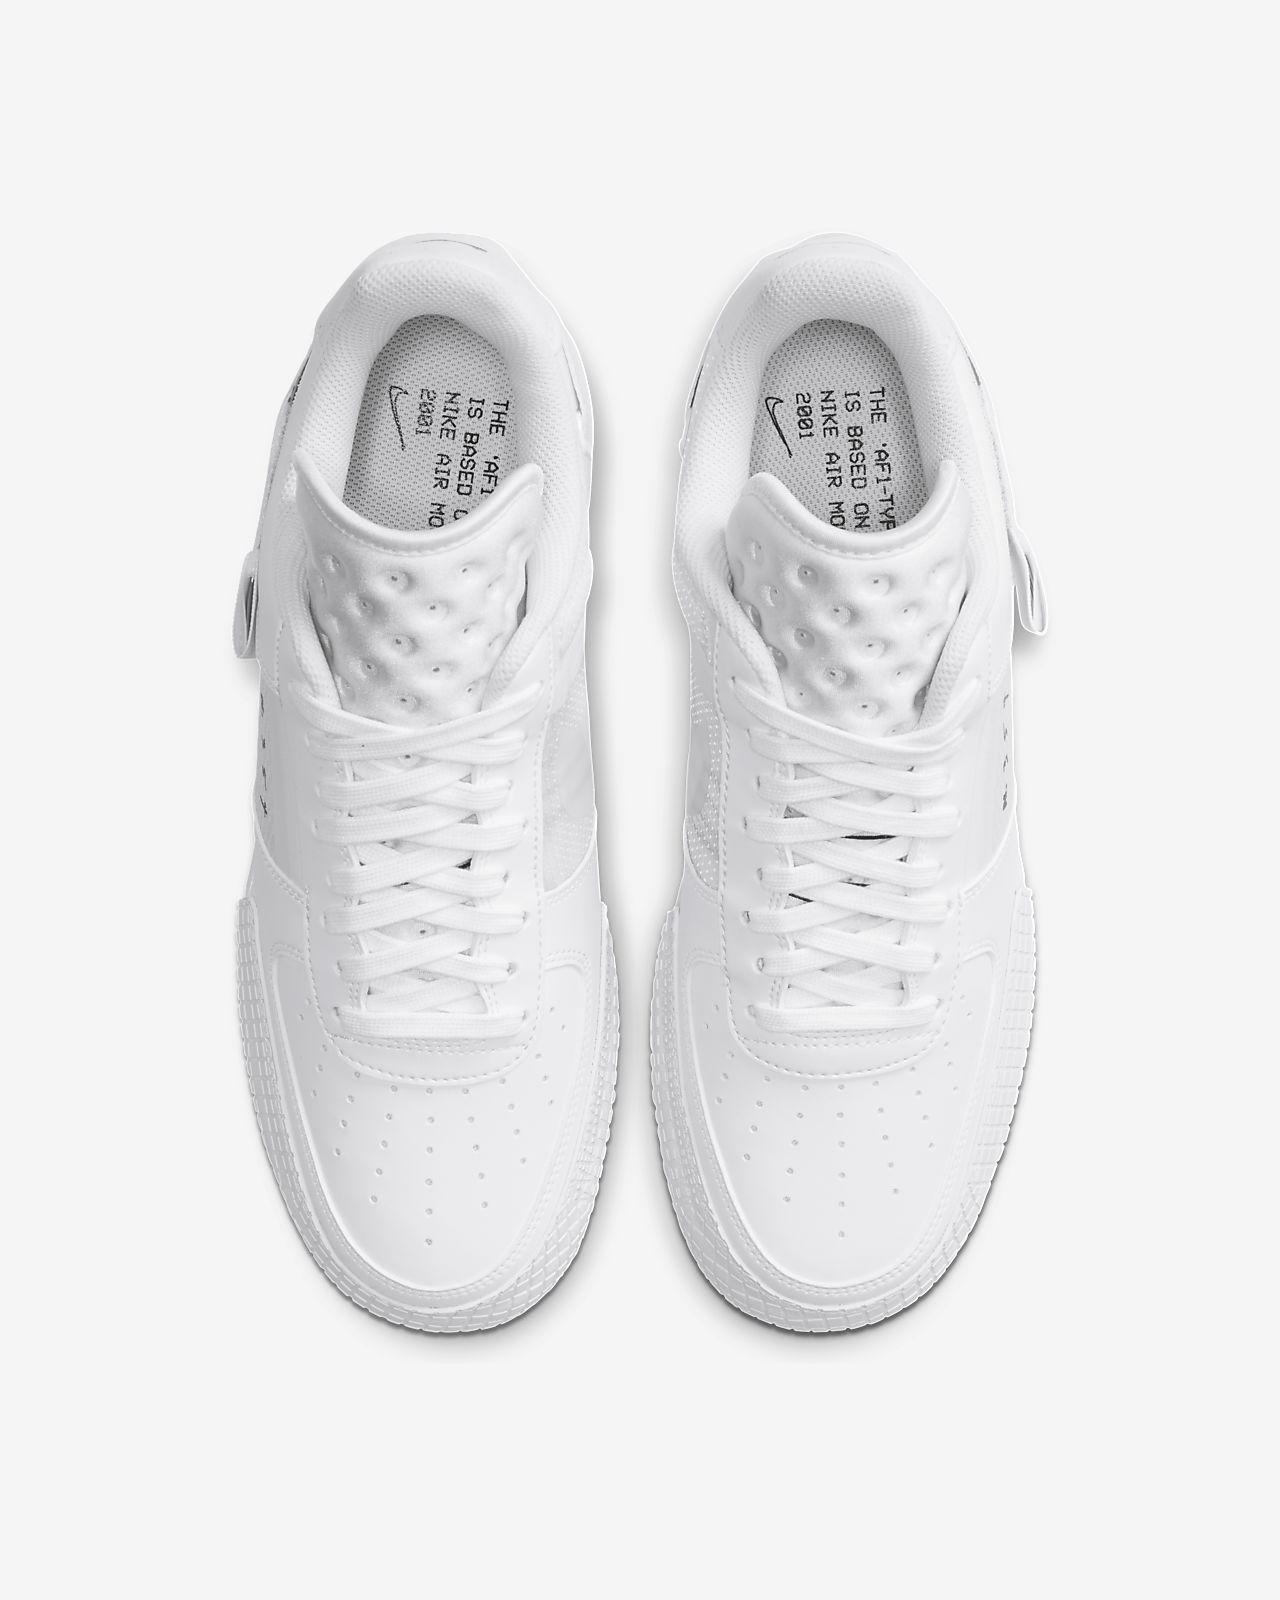 Nike Air Force 1 Type 2 Men's Shoe